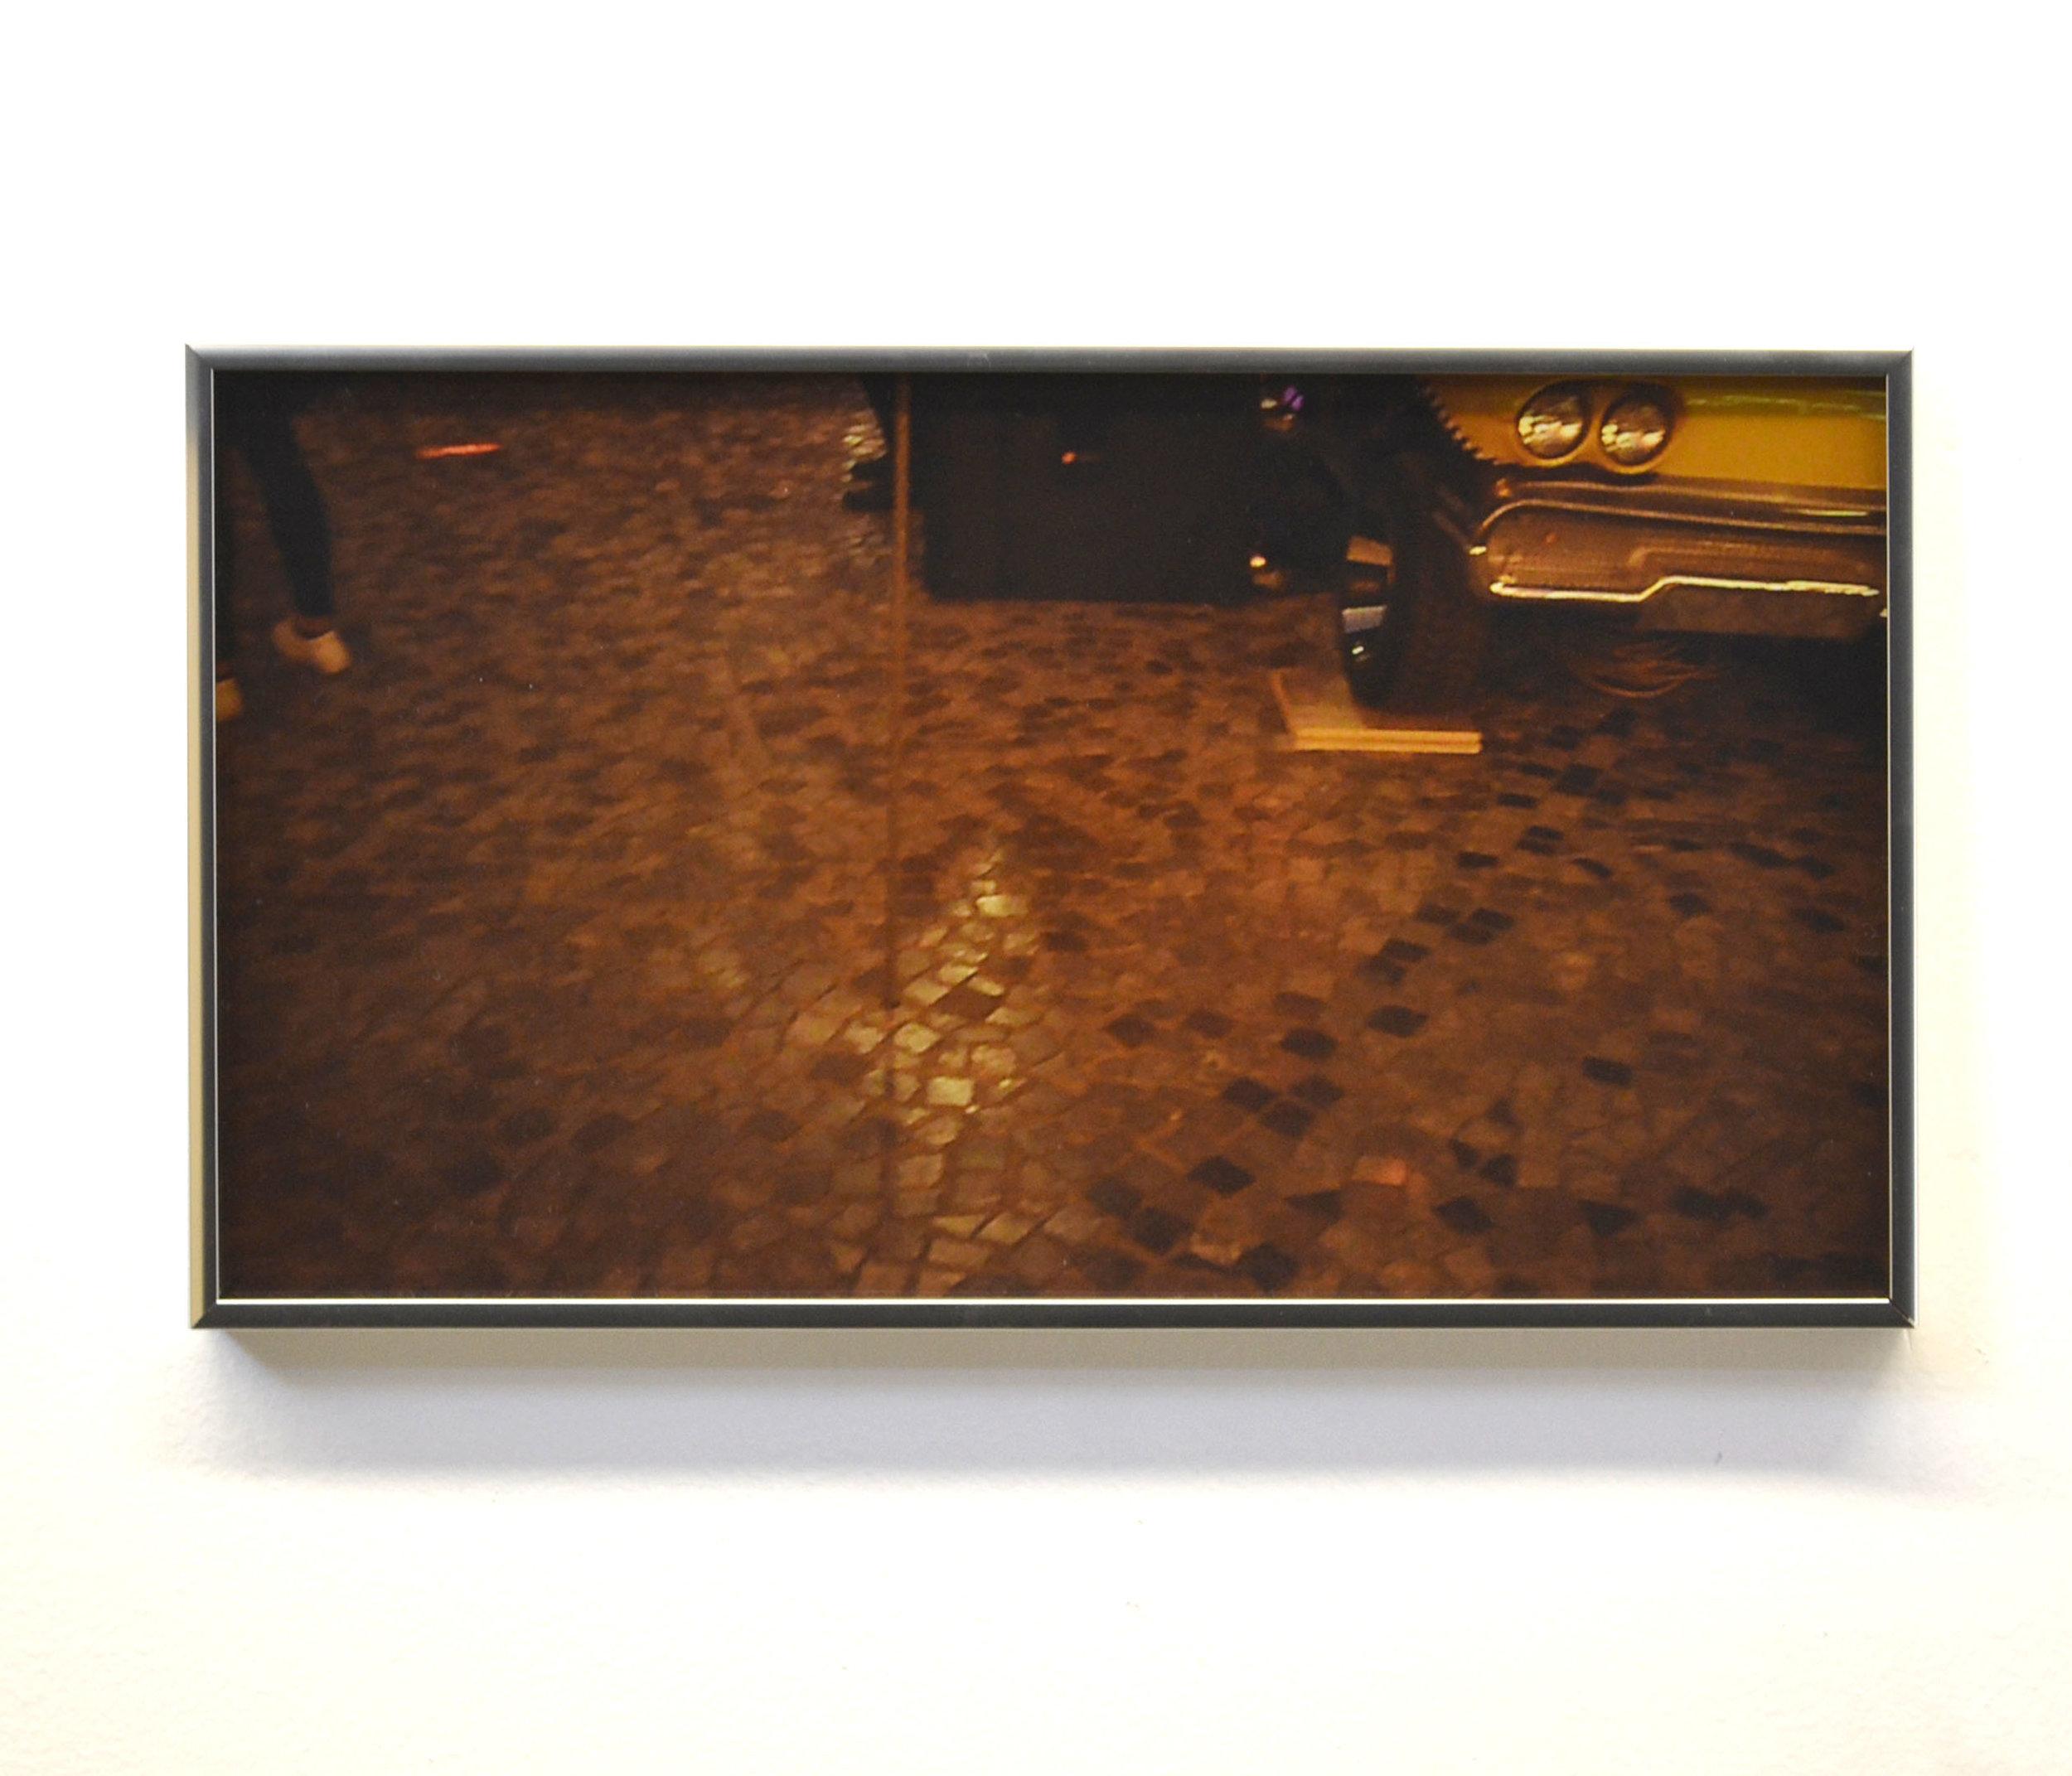 Megan Plunkett, Computer (Voice), 2018, digital C-print on glossy paper, aluminum frames, 9 × 16 in